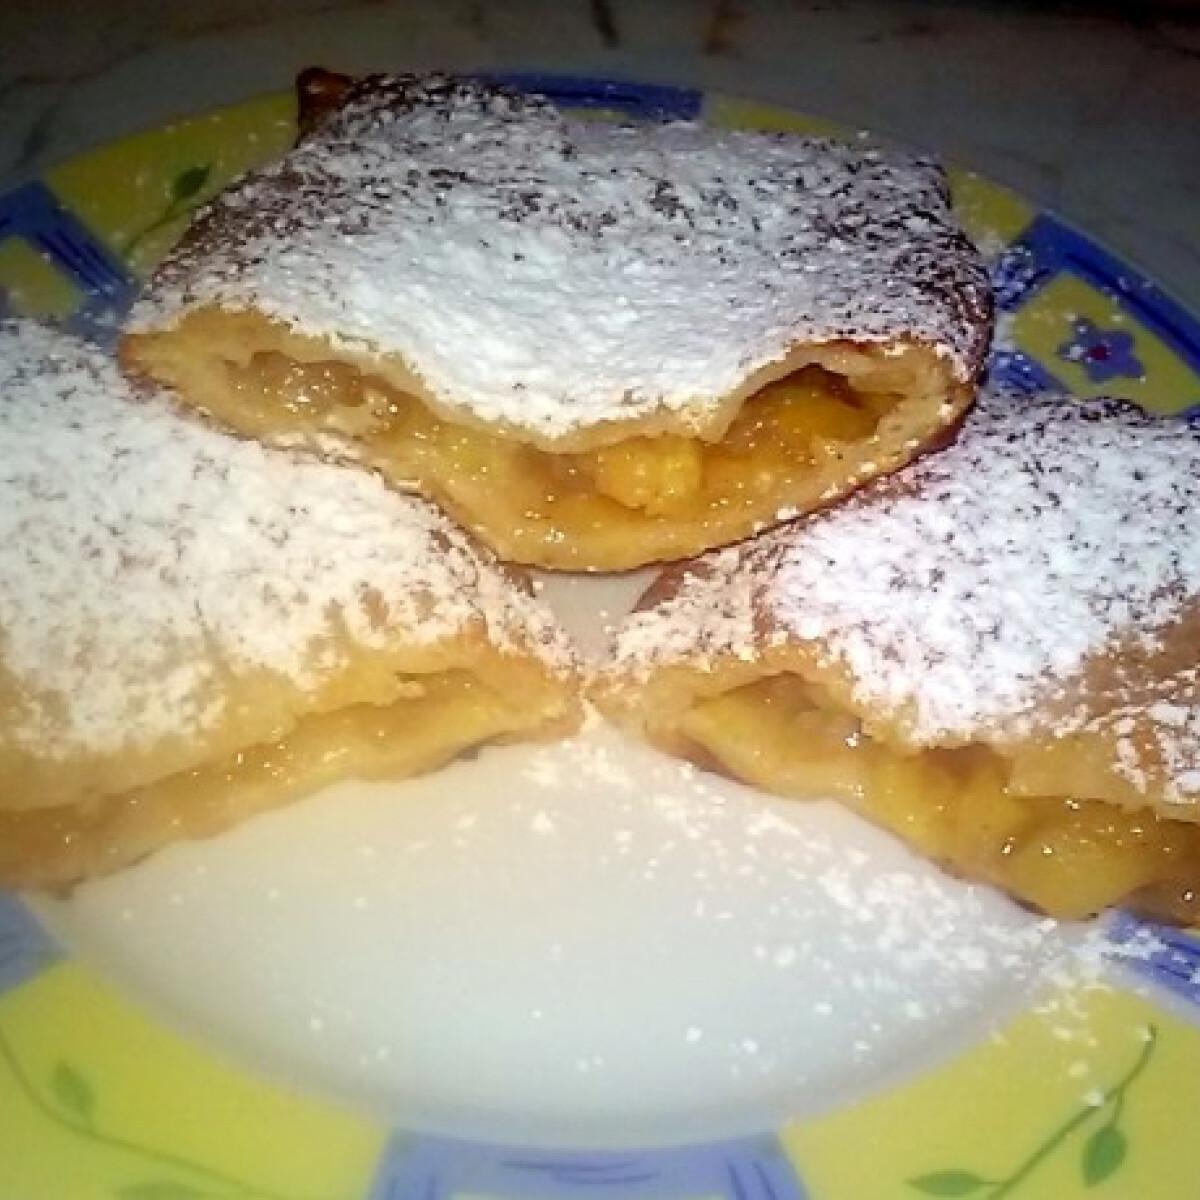 Ezen a képen: Hamis mekis almás pite